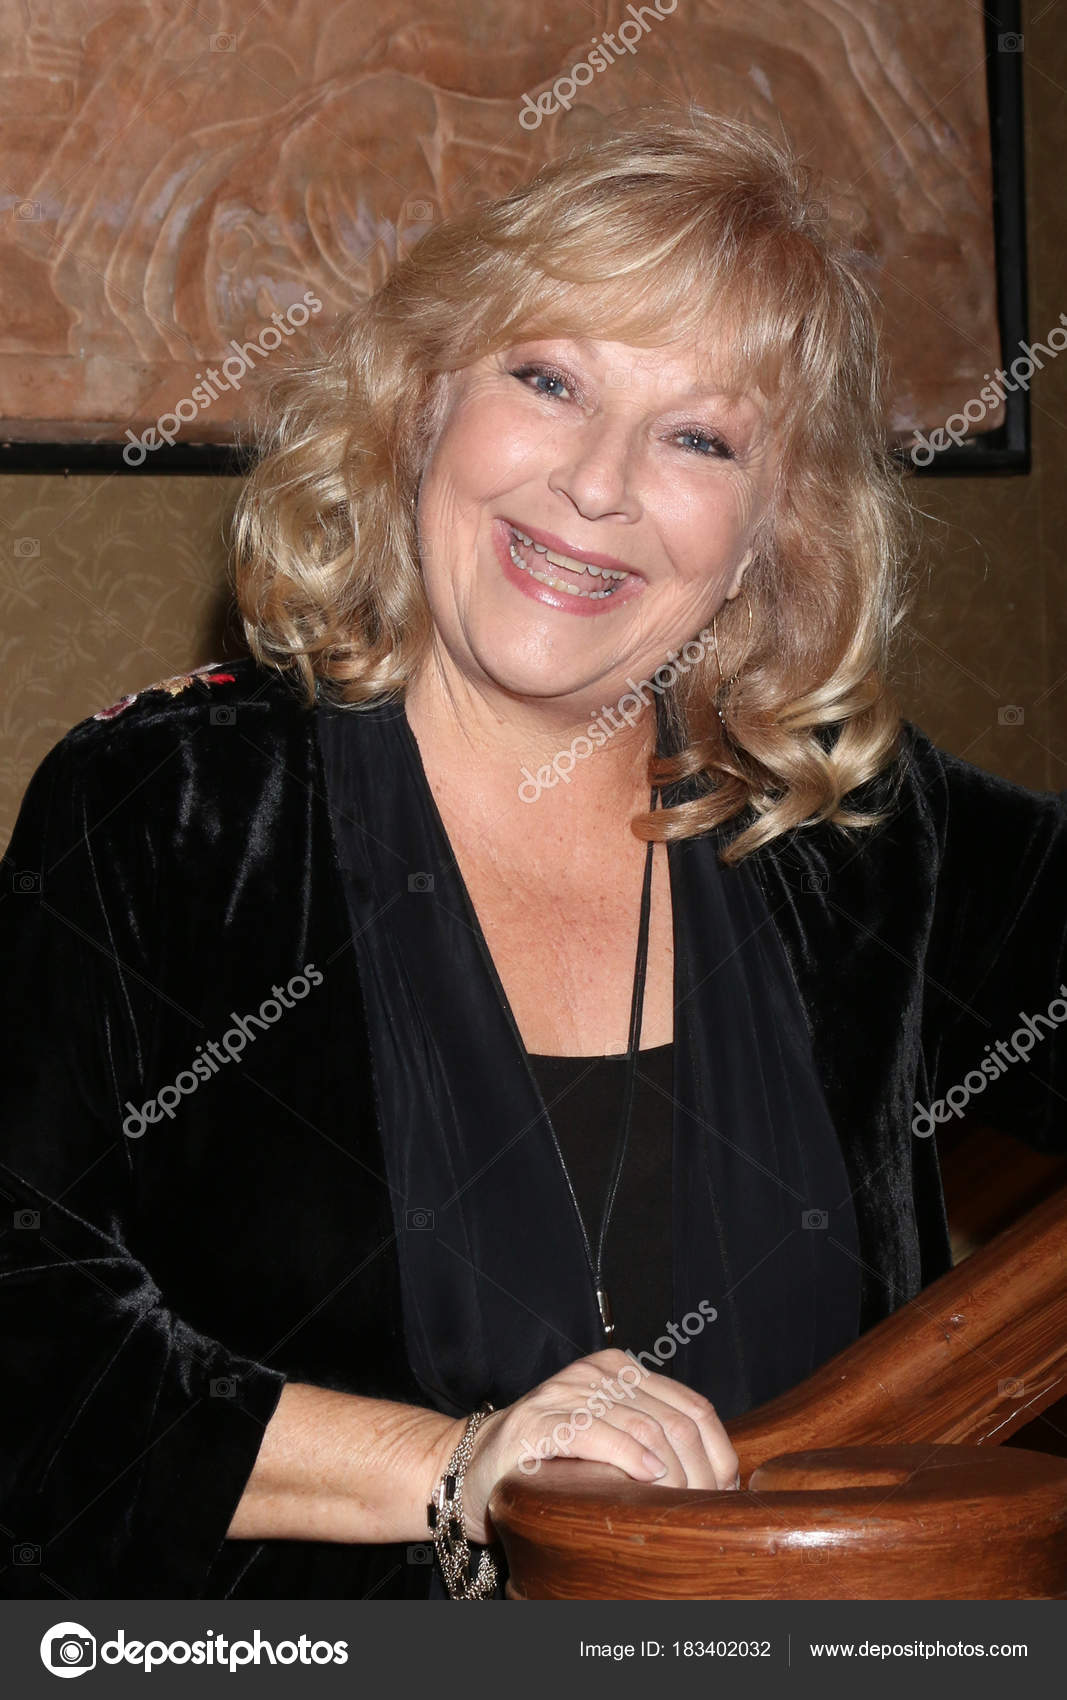 Emily Dunn (actress),Natasha Parry XXX pictures Bonnie Lynn Fields,Fiona Dourif